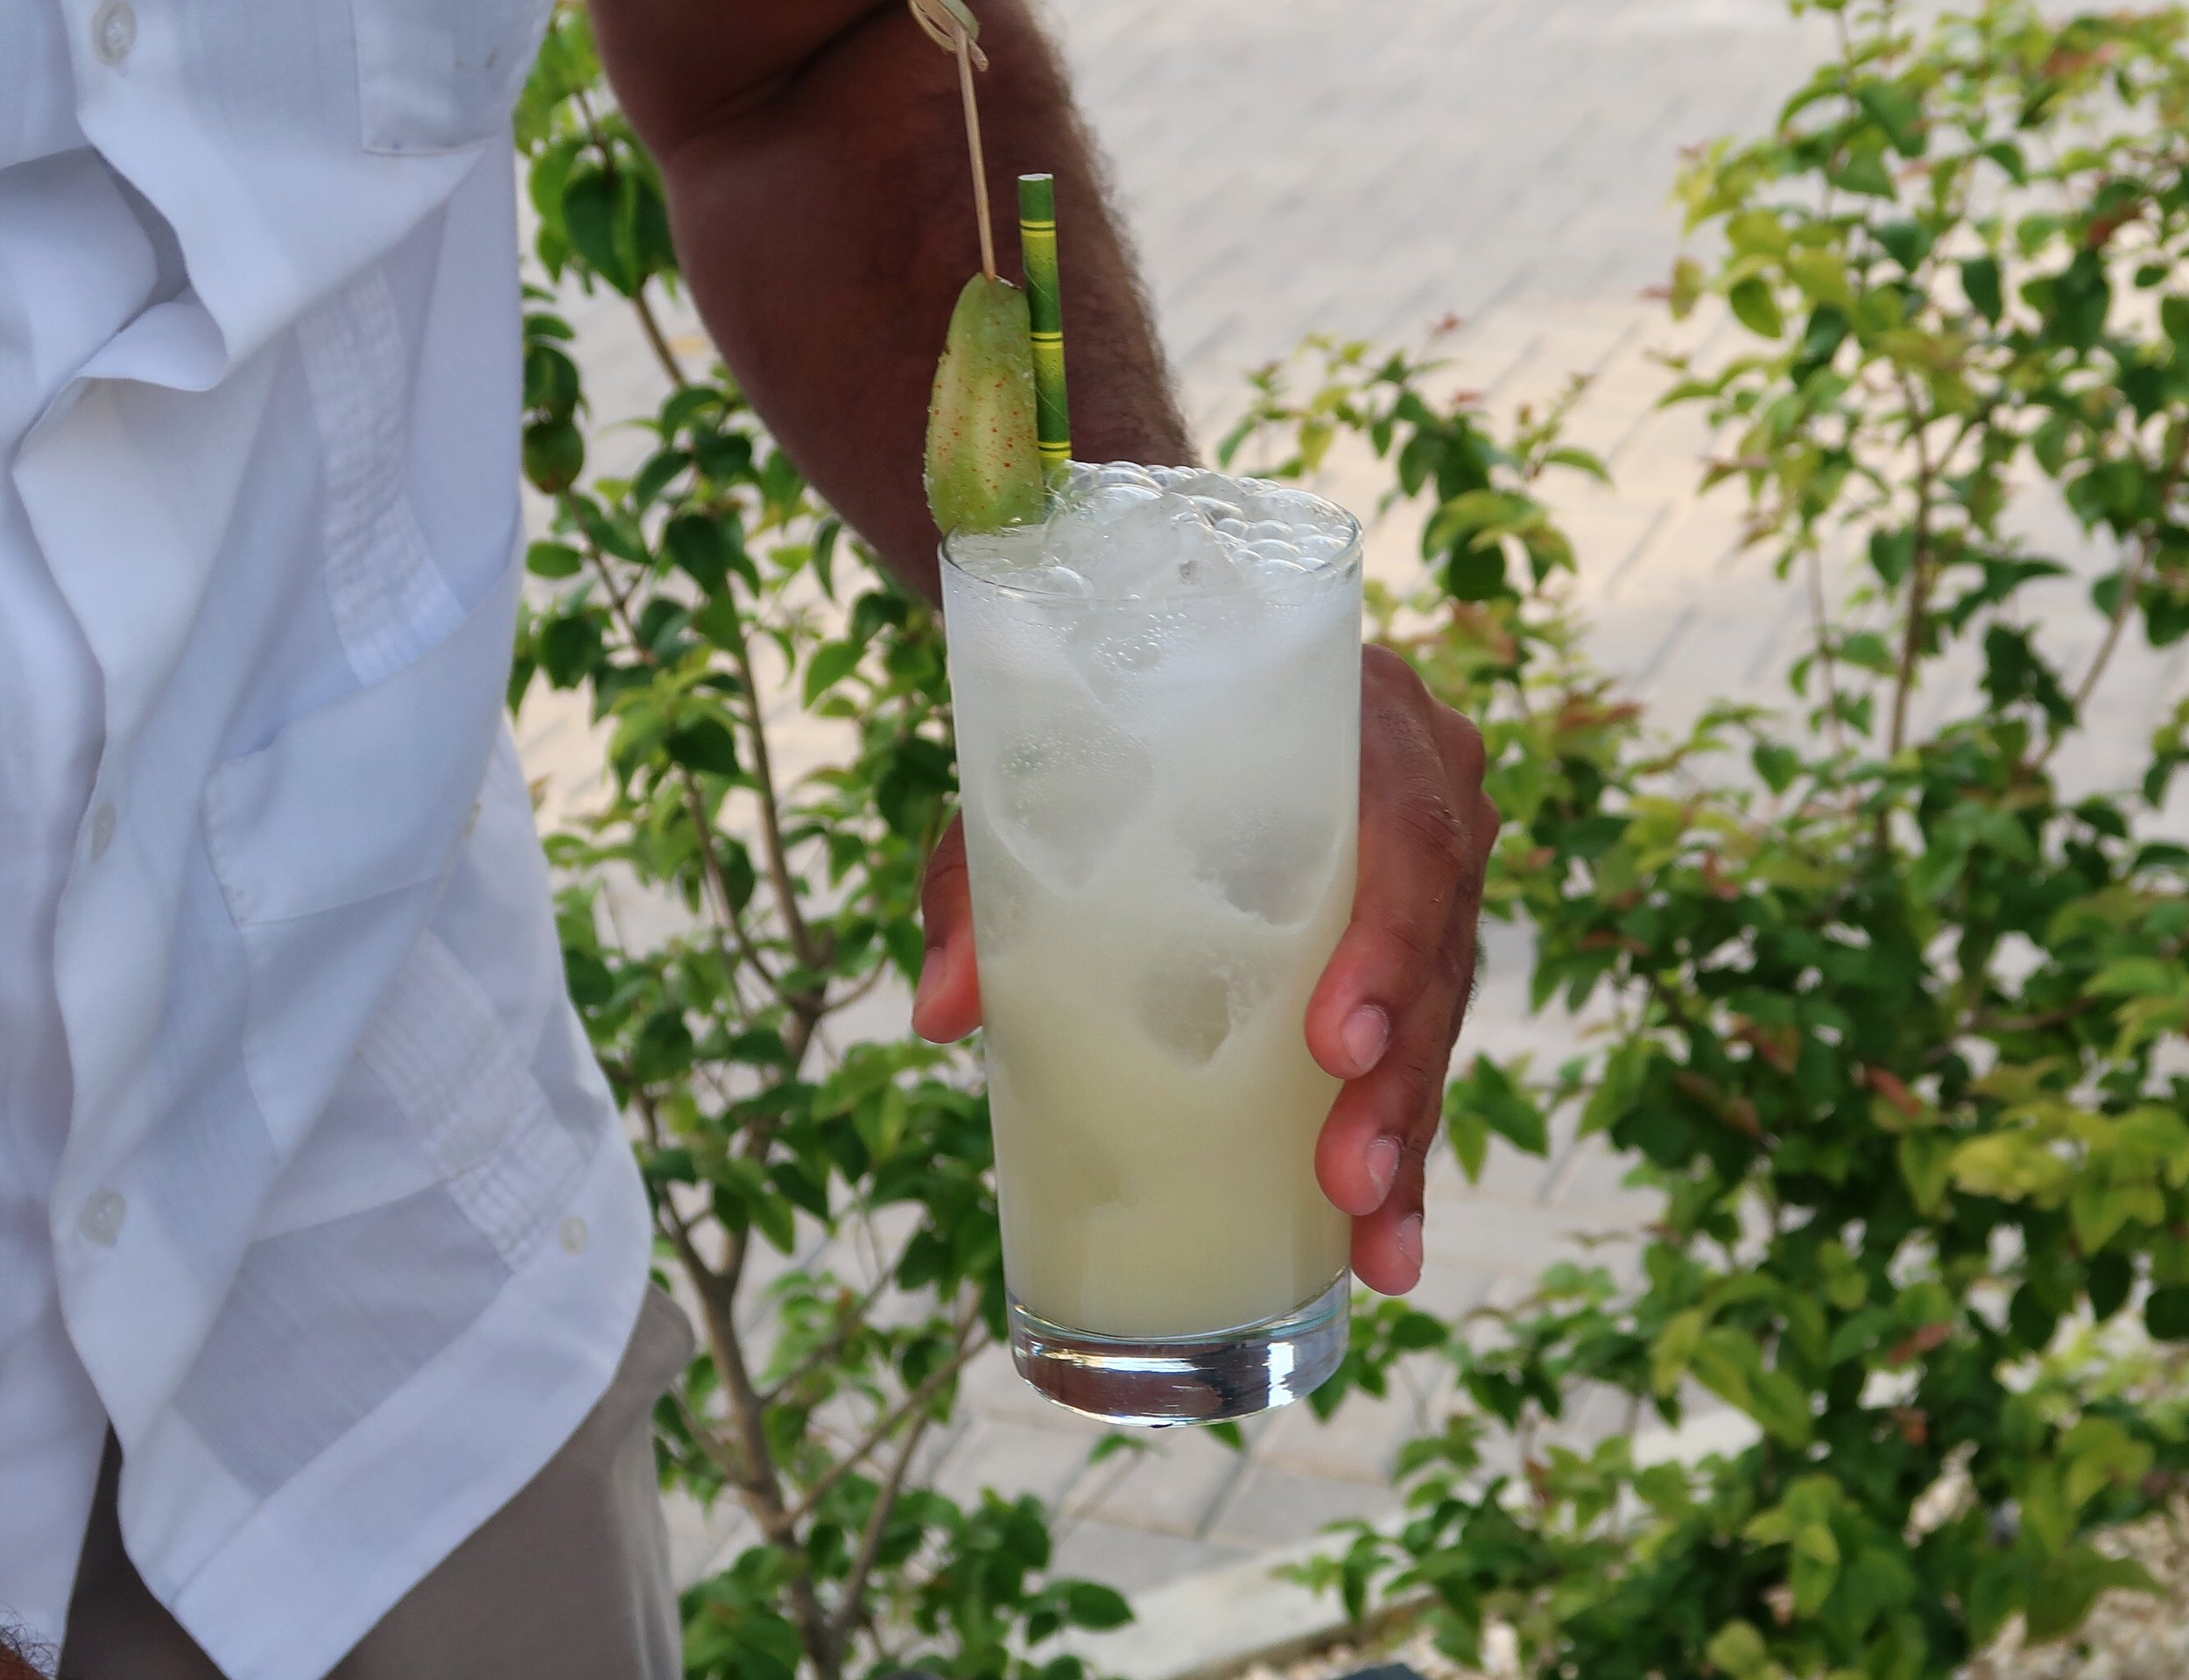 The Bilimbi cocktail